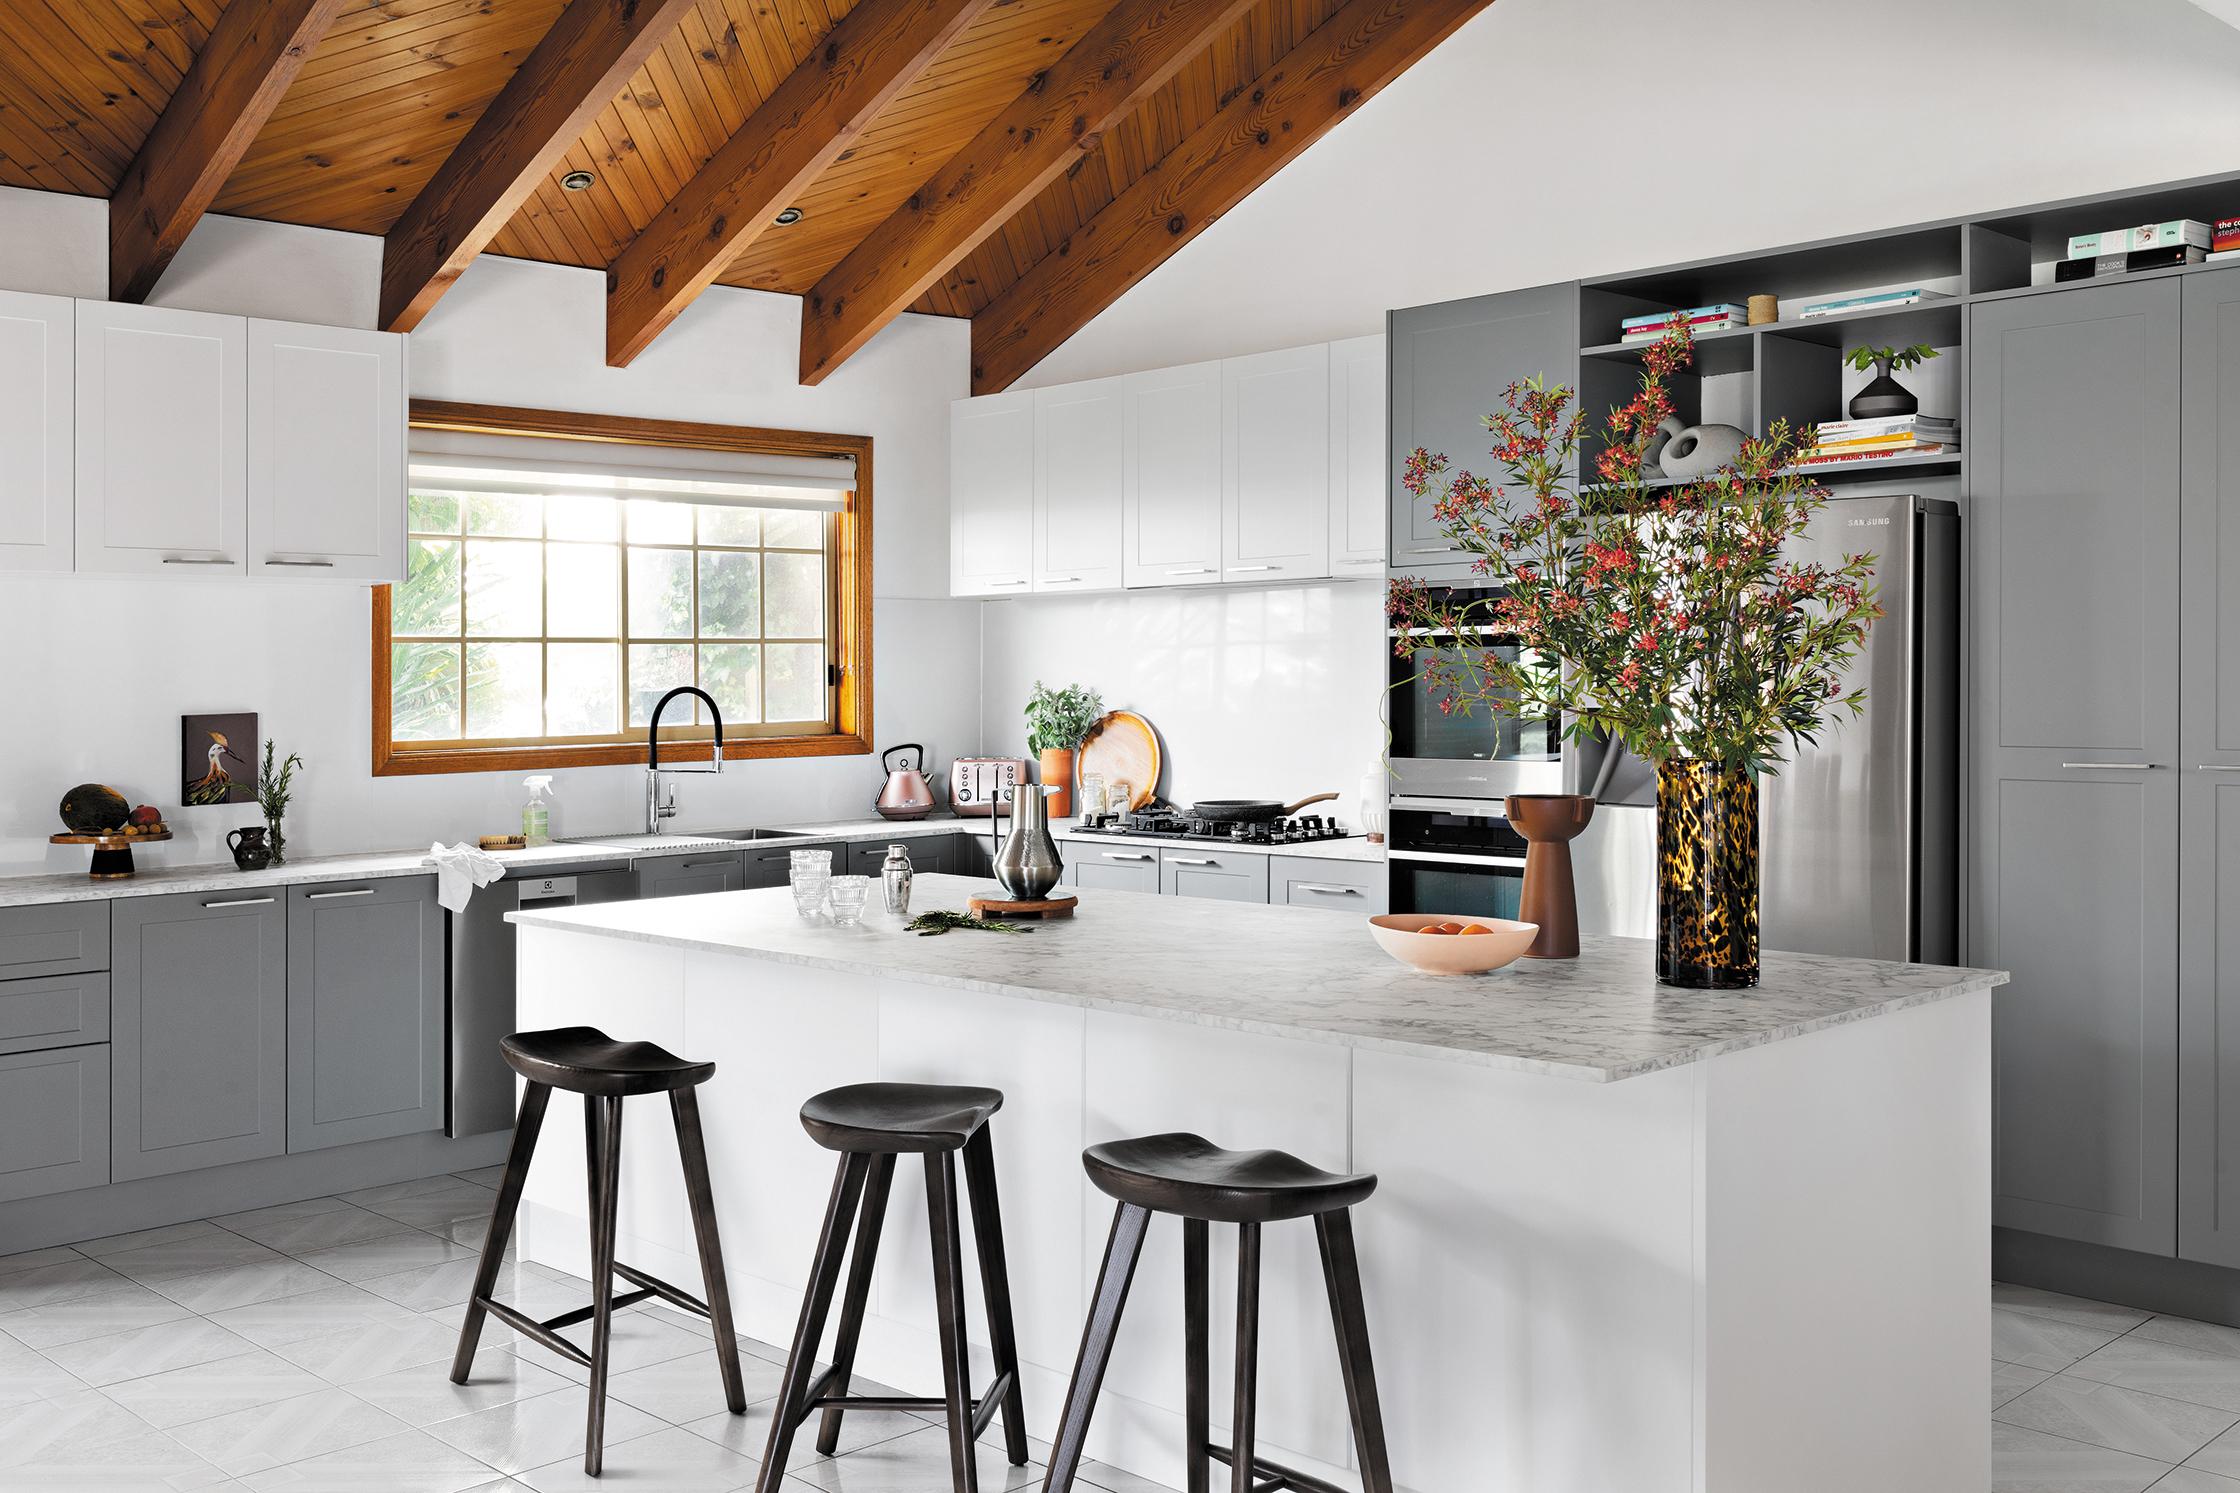 2021 kitchen trends forecast  kaboodle kitchen